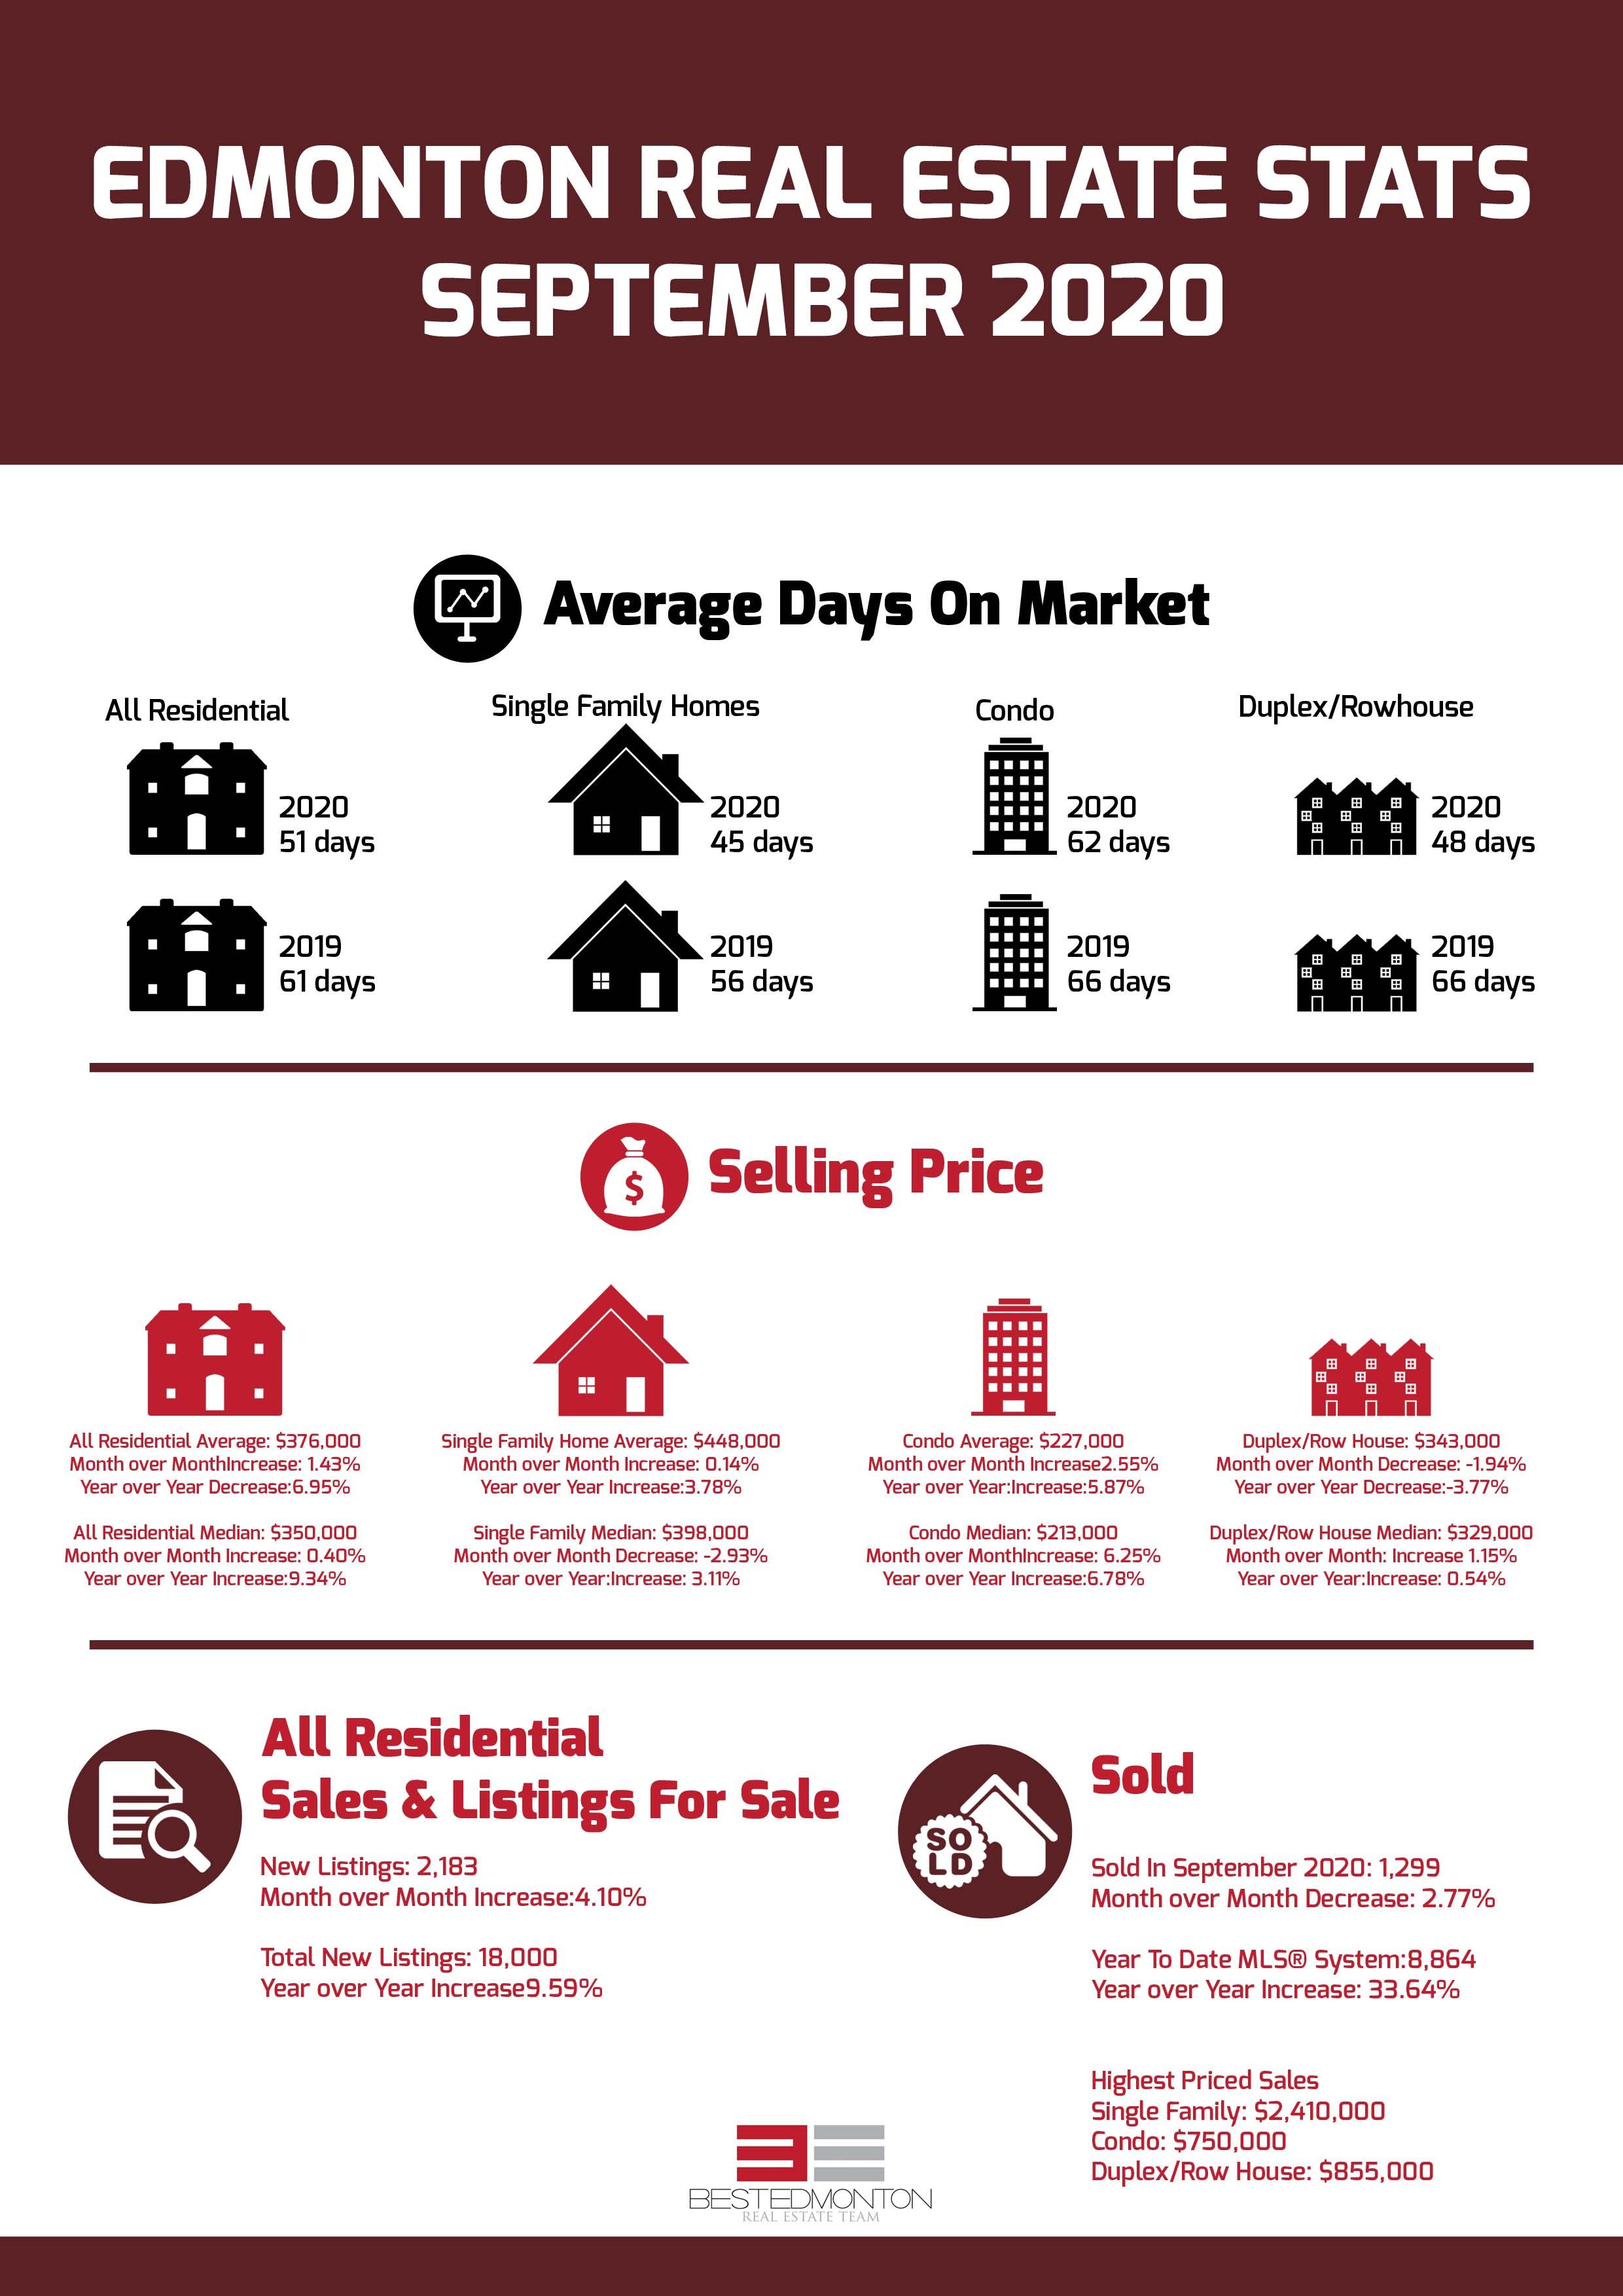 Edmonton Real Estate Stats September 2020